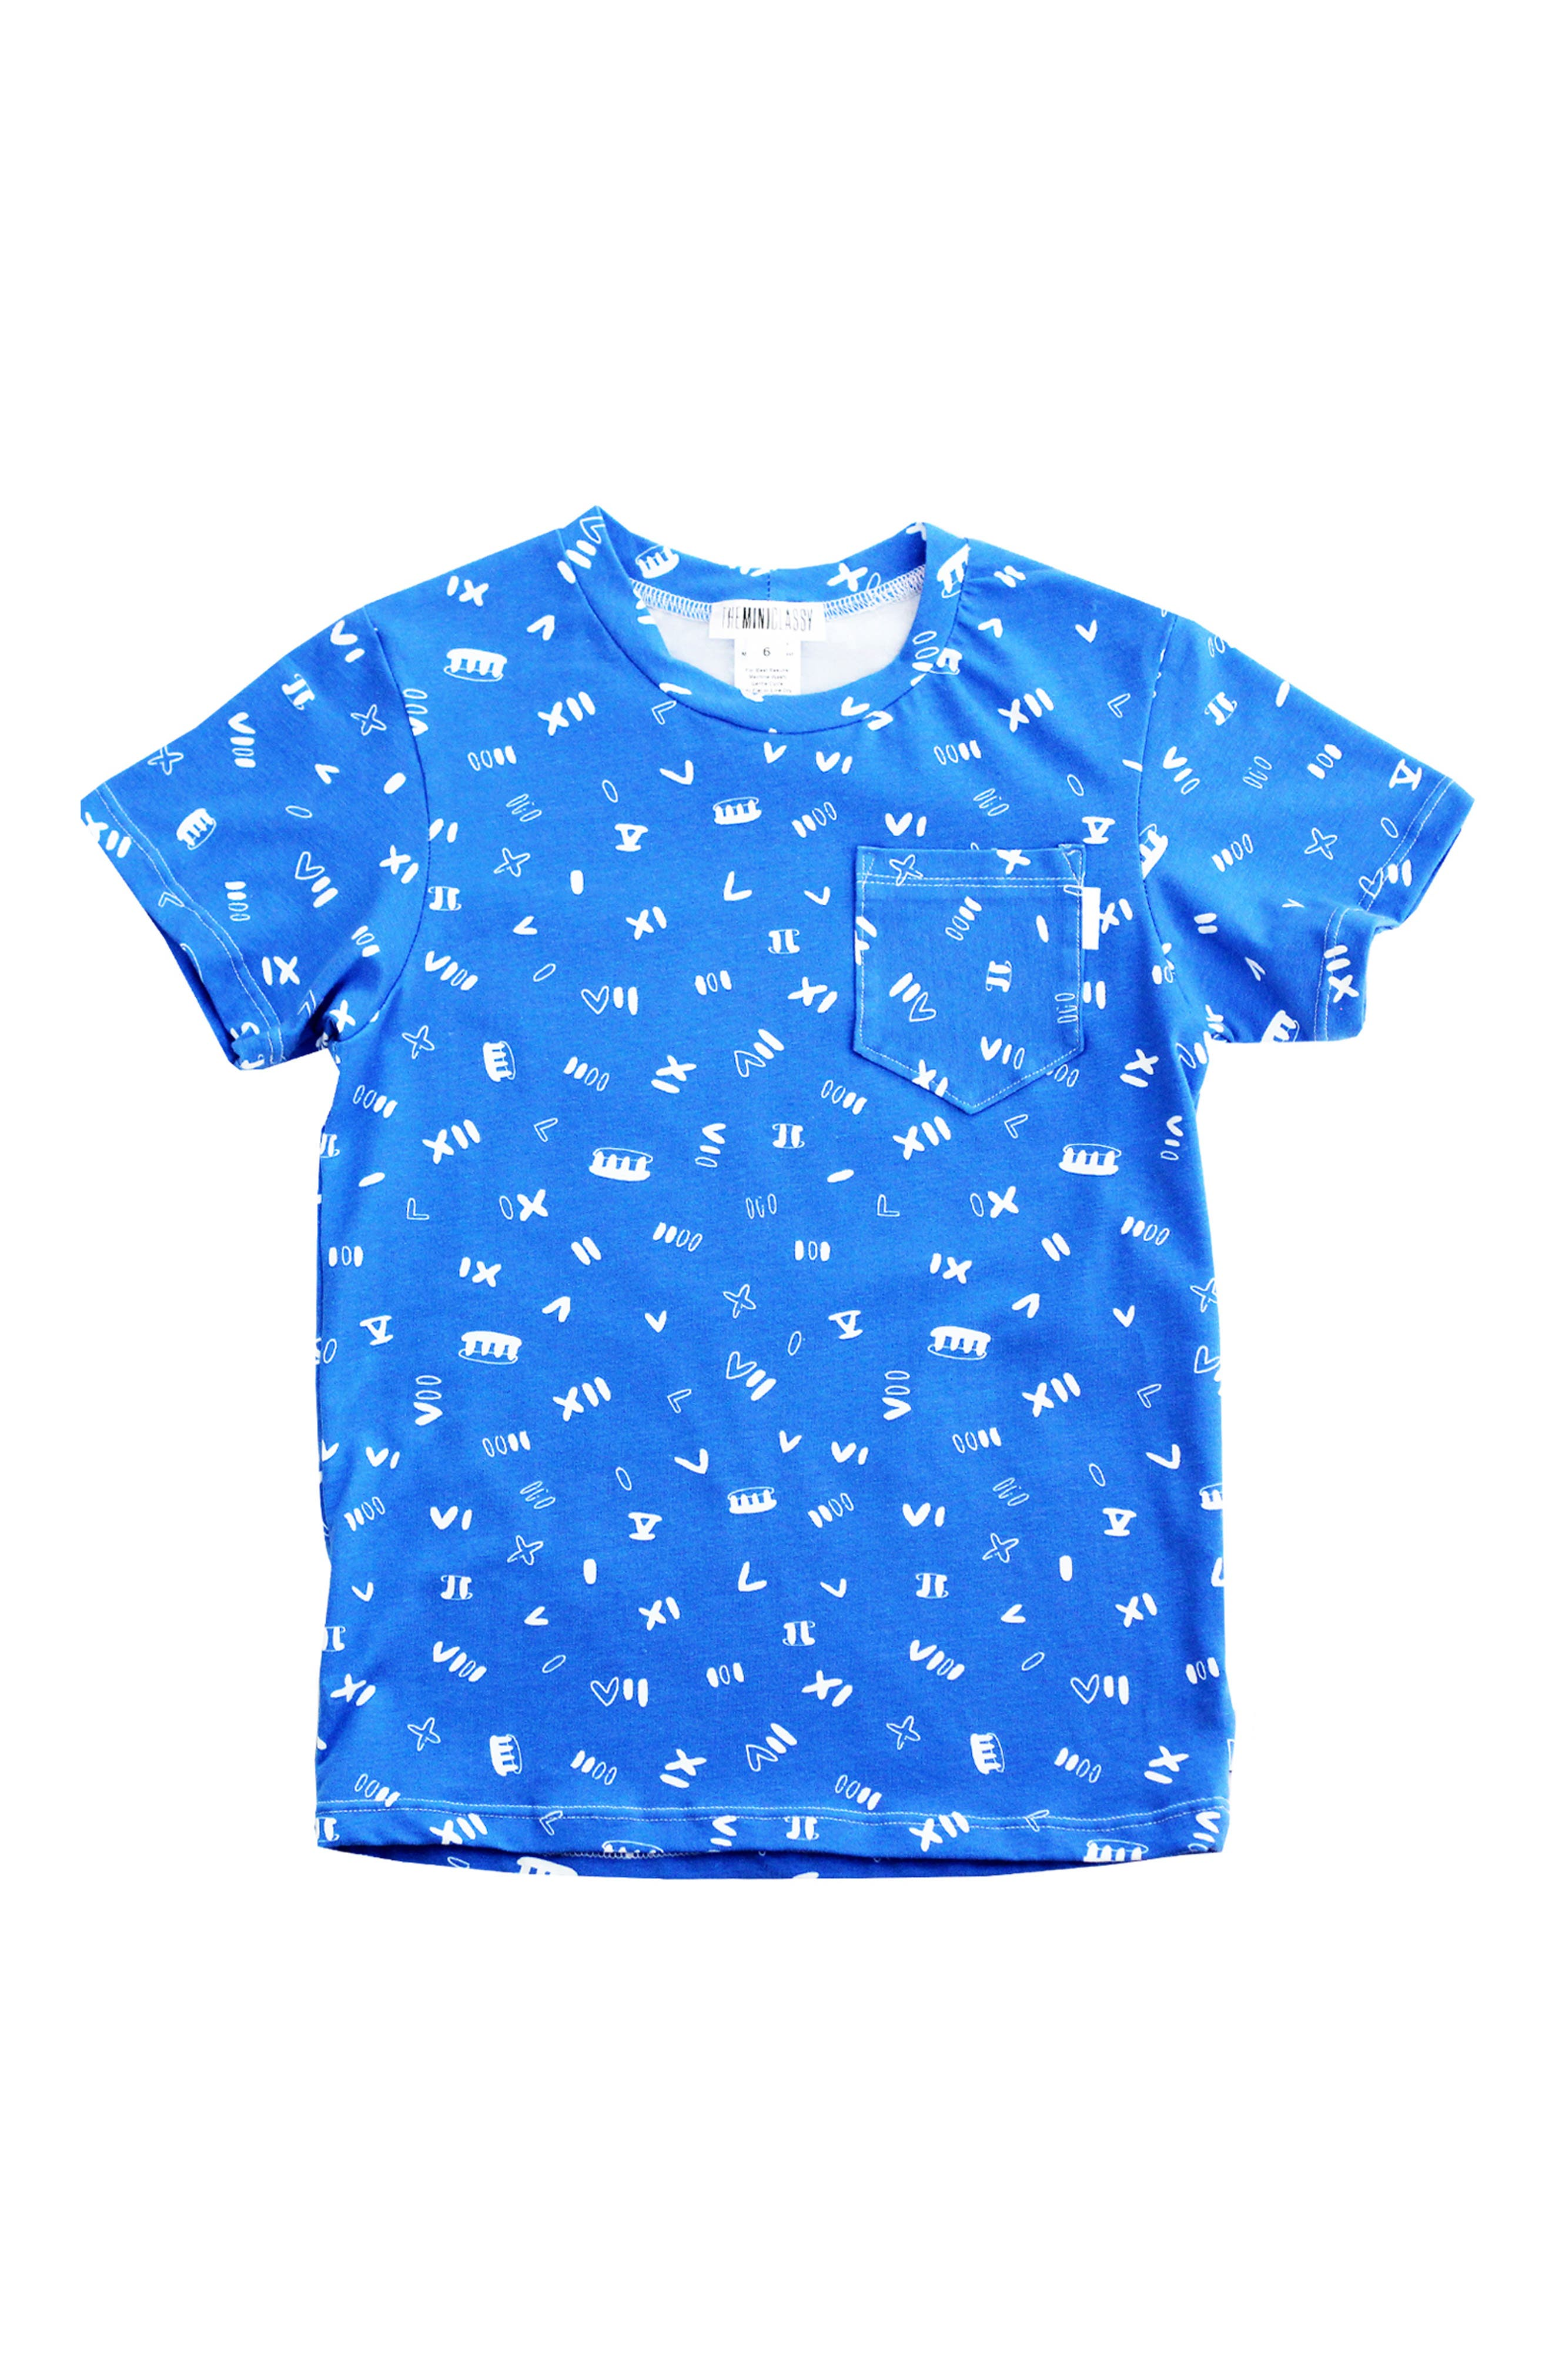 Alternate Image 1 Selected - theMINIclassy Roman Noodle Print Pocket T-Shirt (Toddler Boys & Little Boys)